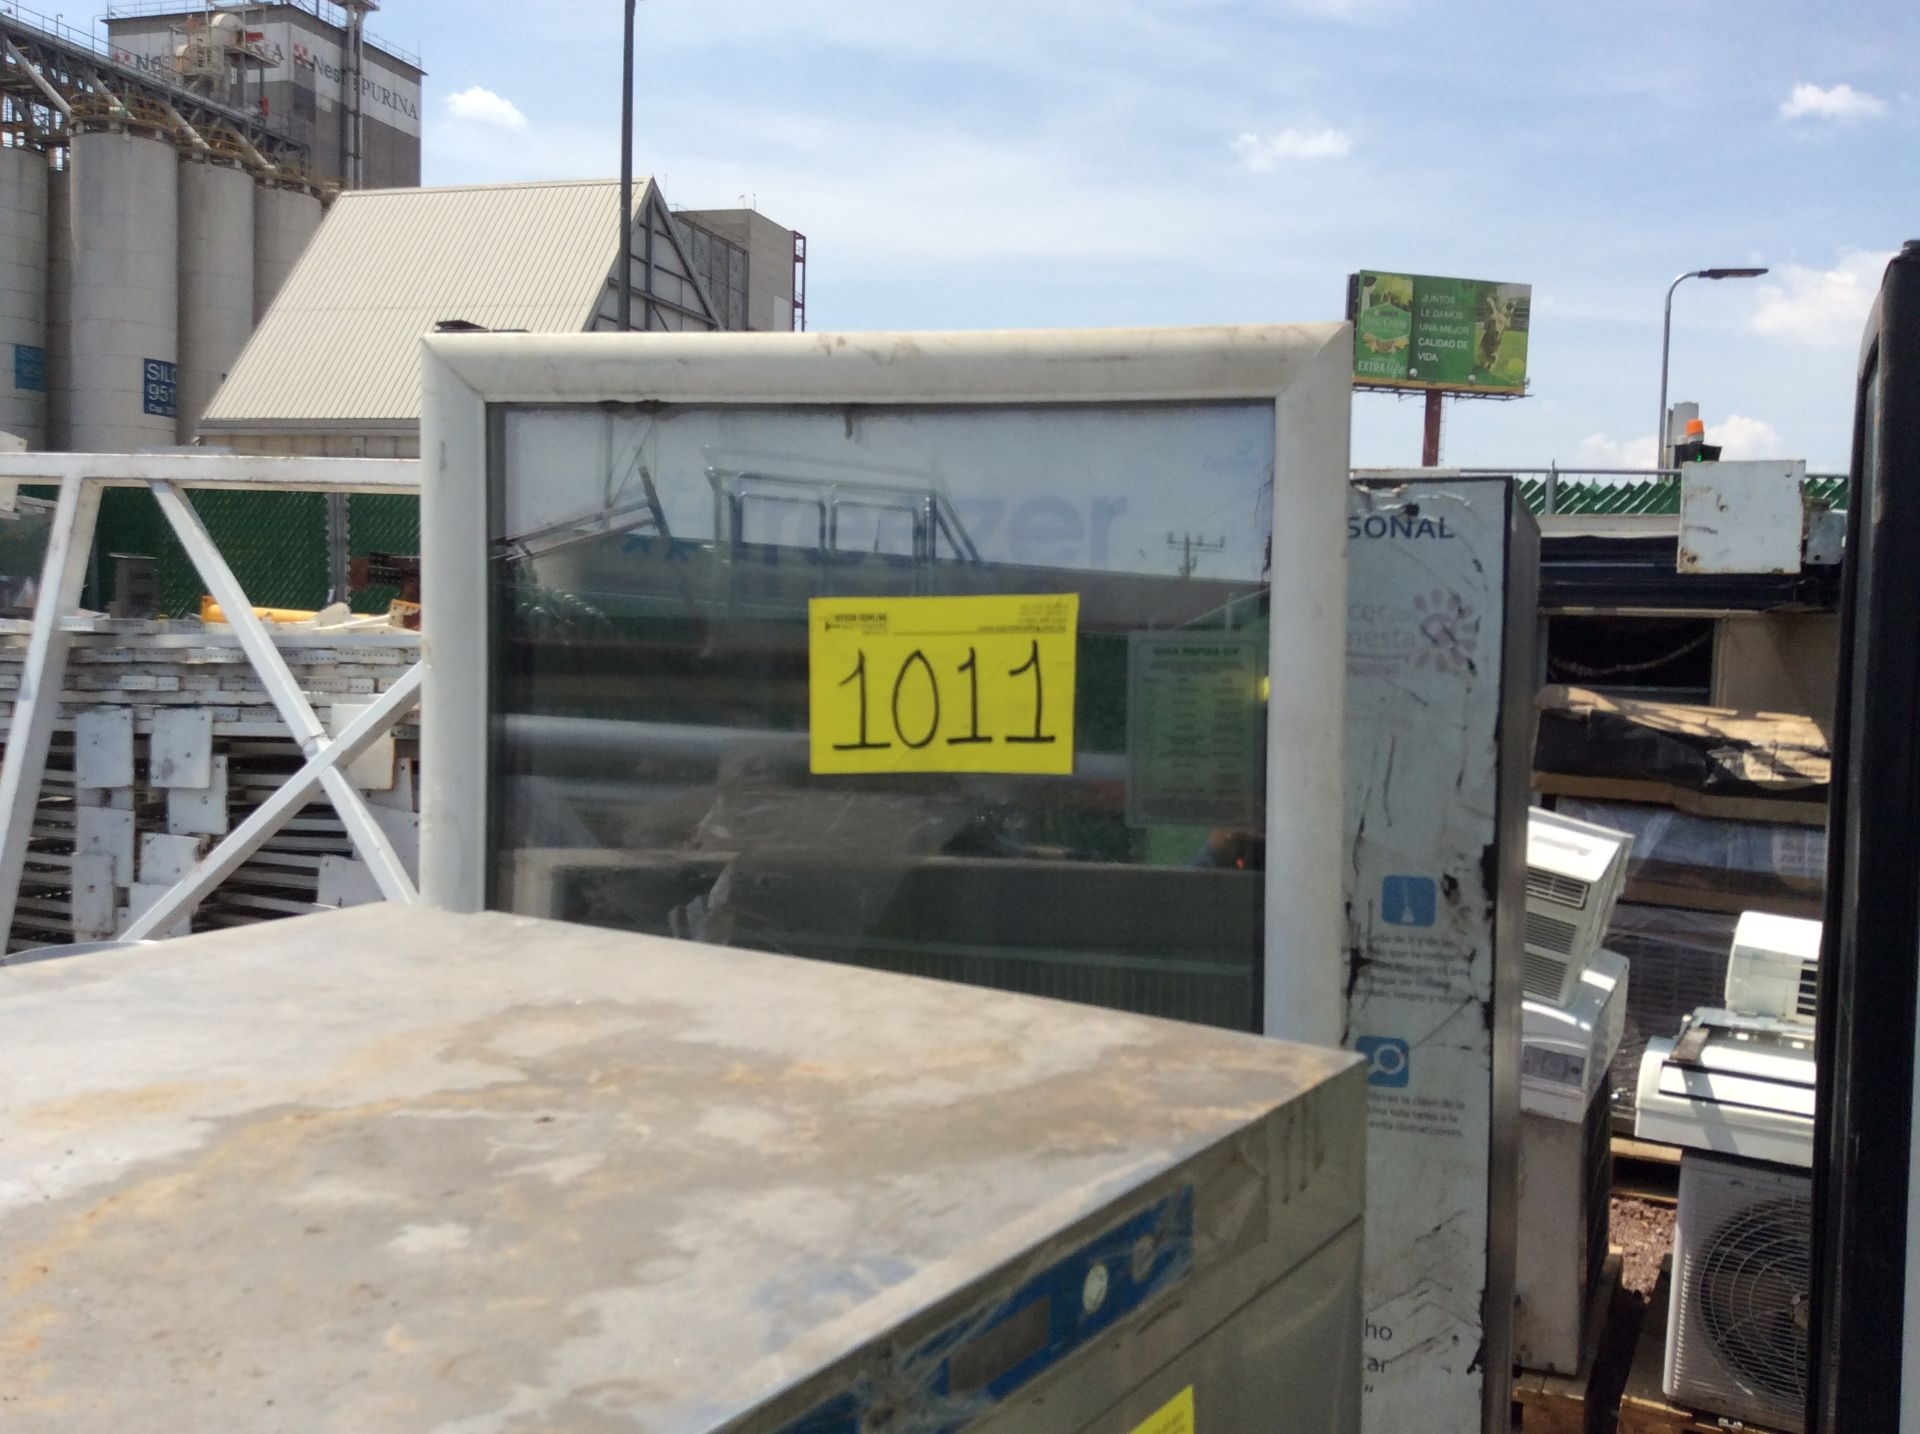 1 Ojeda refrigerator of double glass door model RV2P36 serial number 0636323-34305 120V - Image 12 of 14